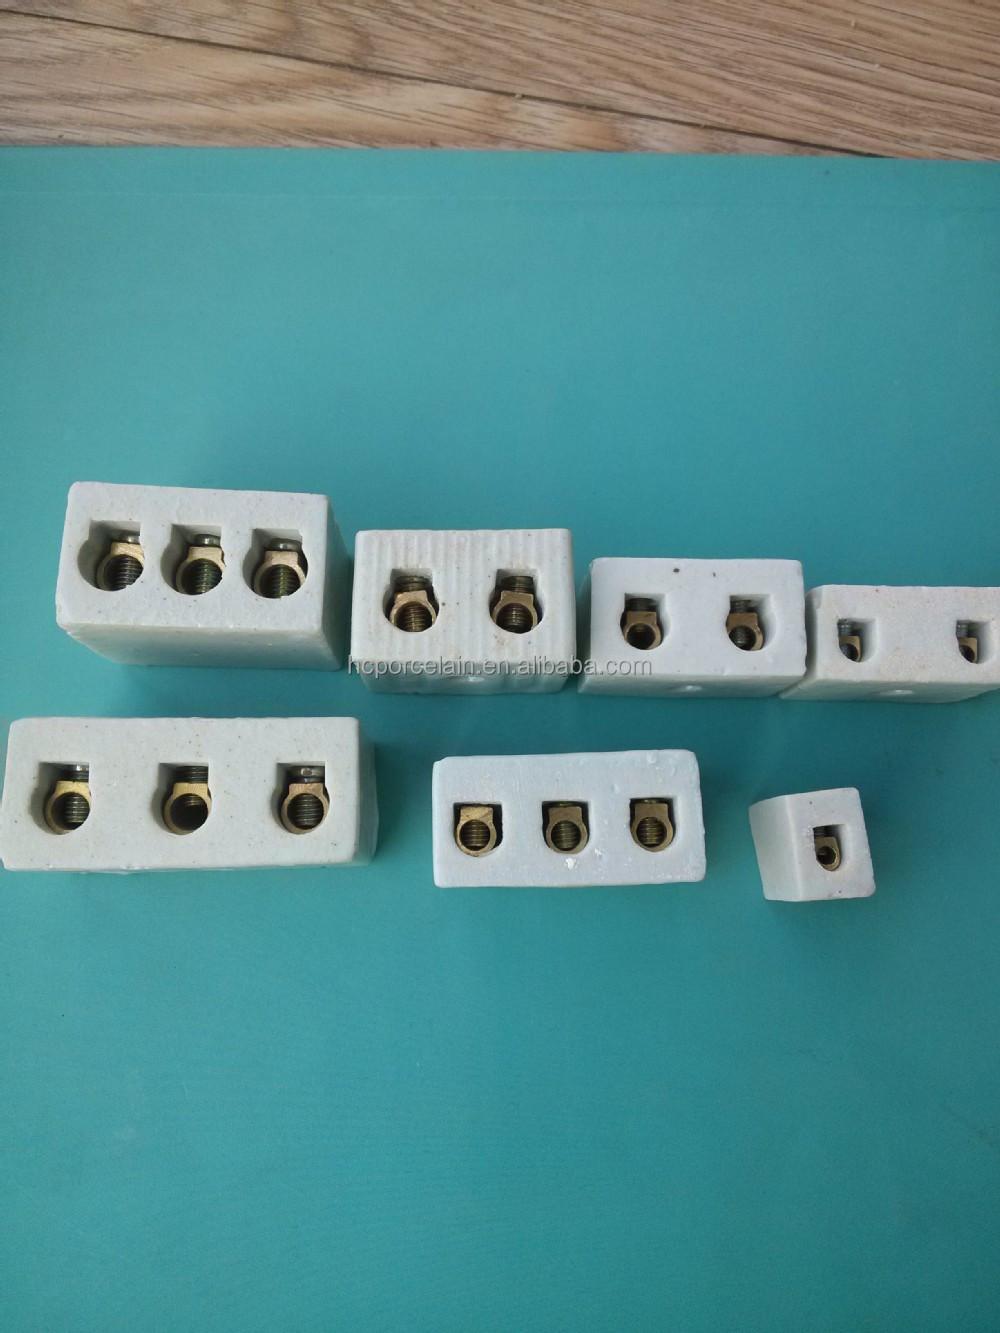 H 1512 Porcelain Terminal Block Ceramic Electric Connector